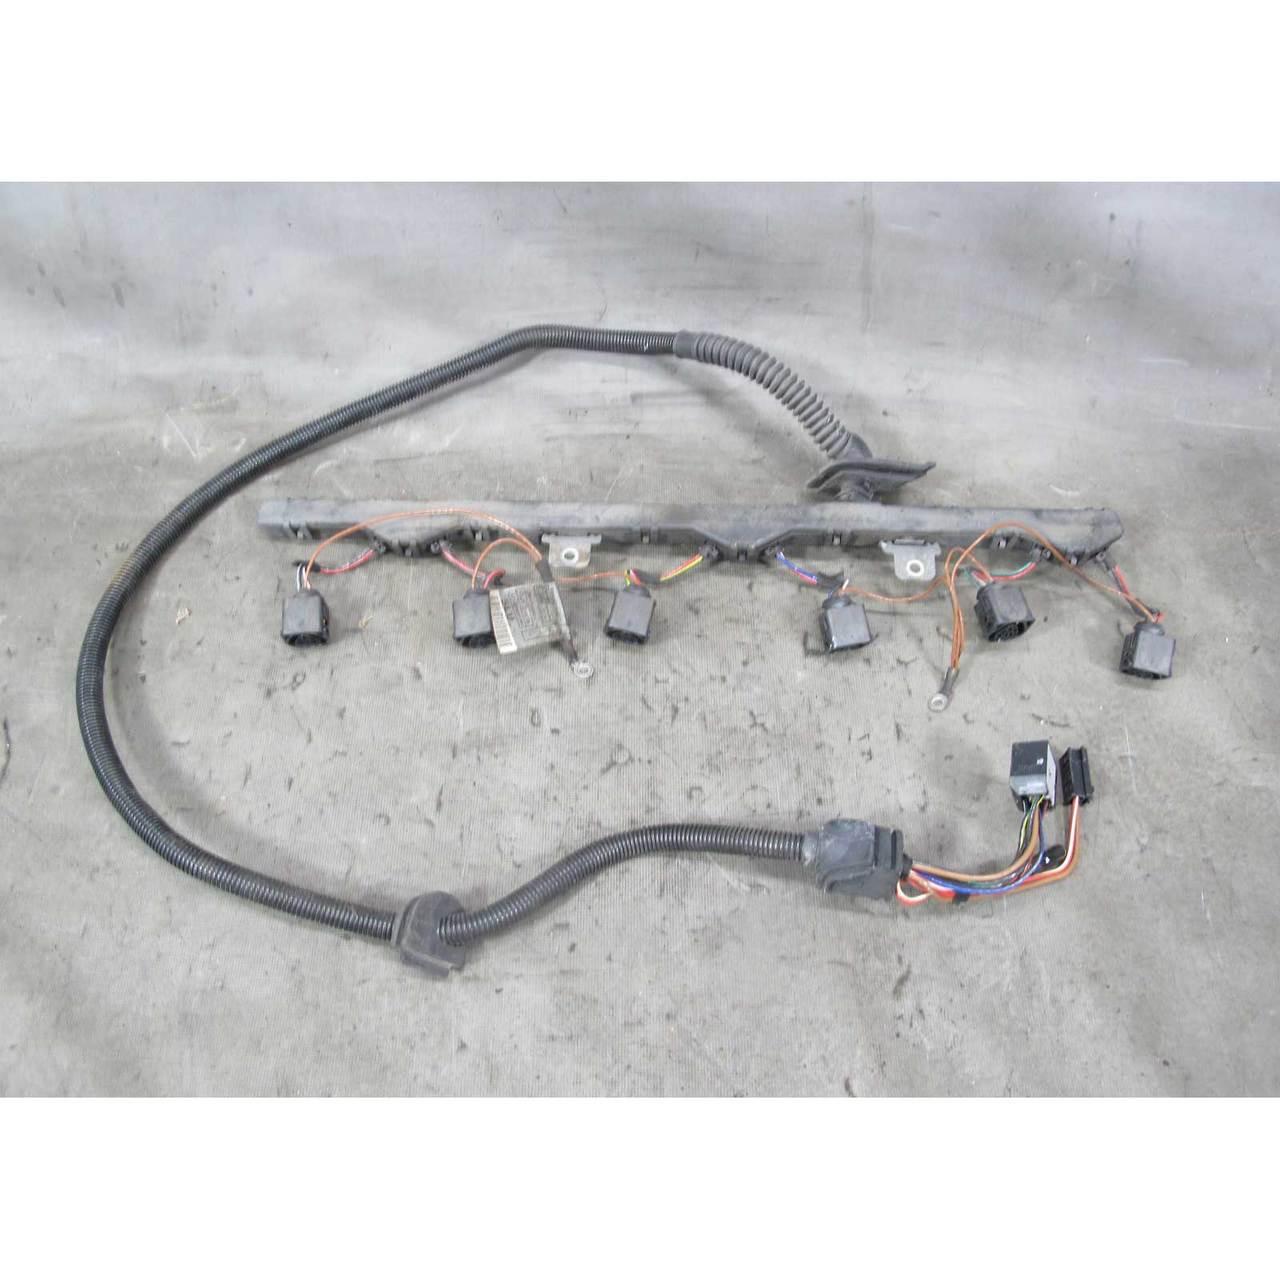 2003 2006 bmw e46 325i sulev m56 2 5l engine ignition coil wiring harness oem [ 1280 x 1280 Pixel ]